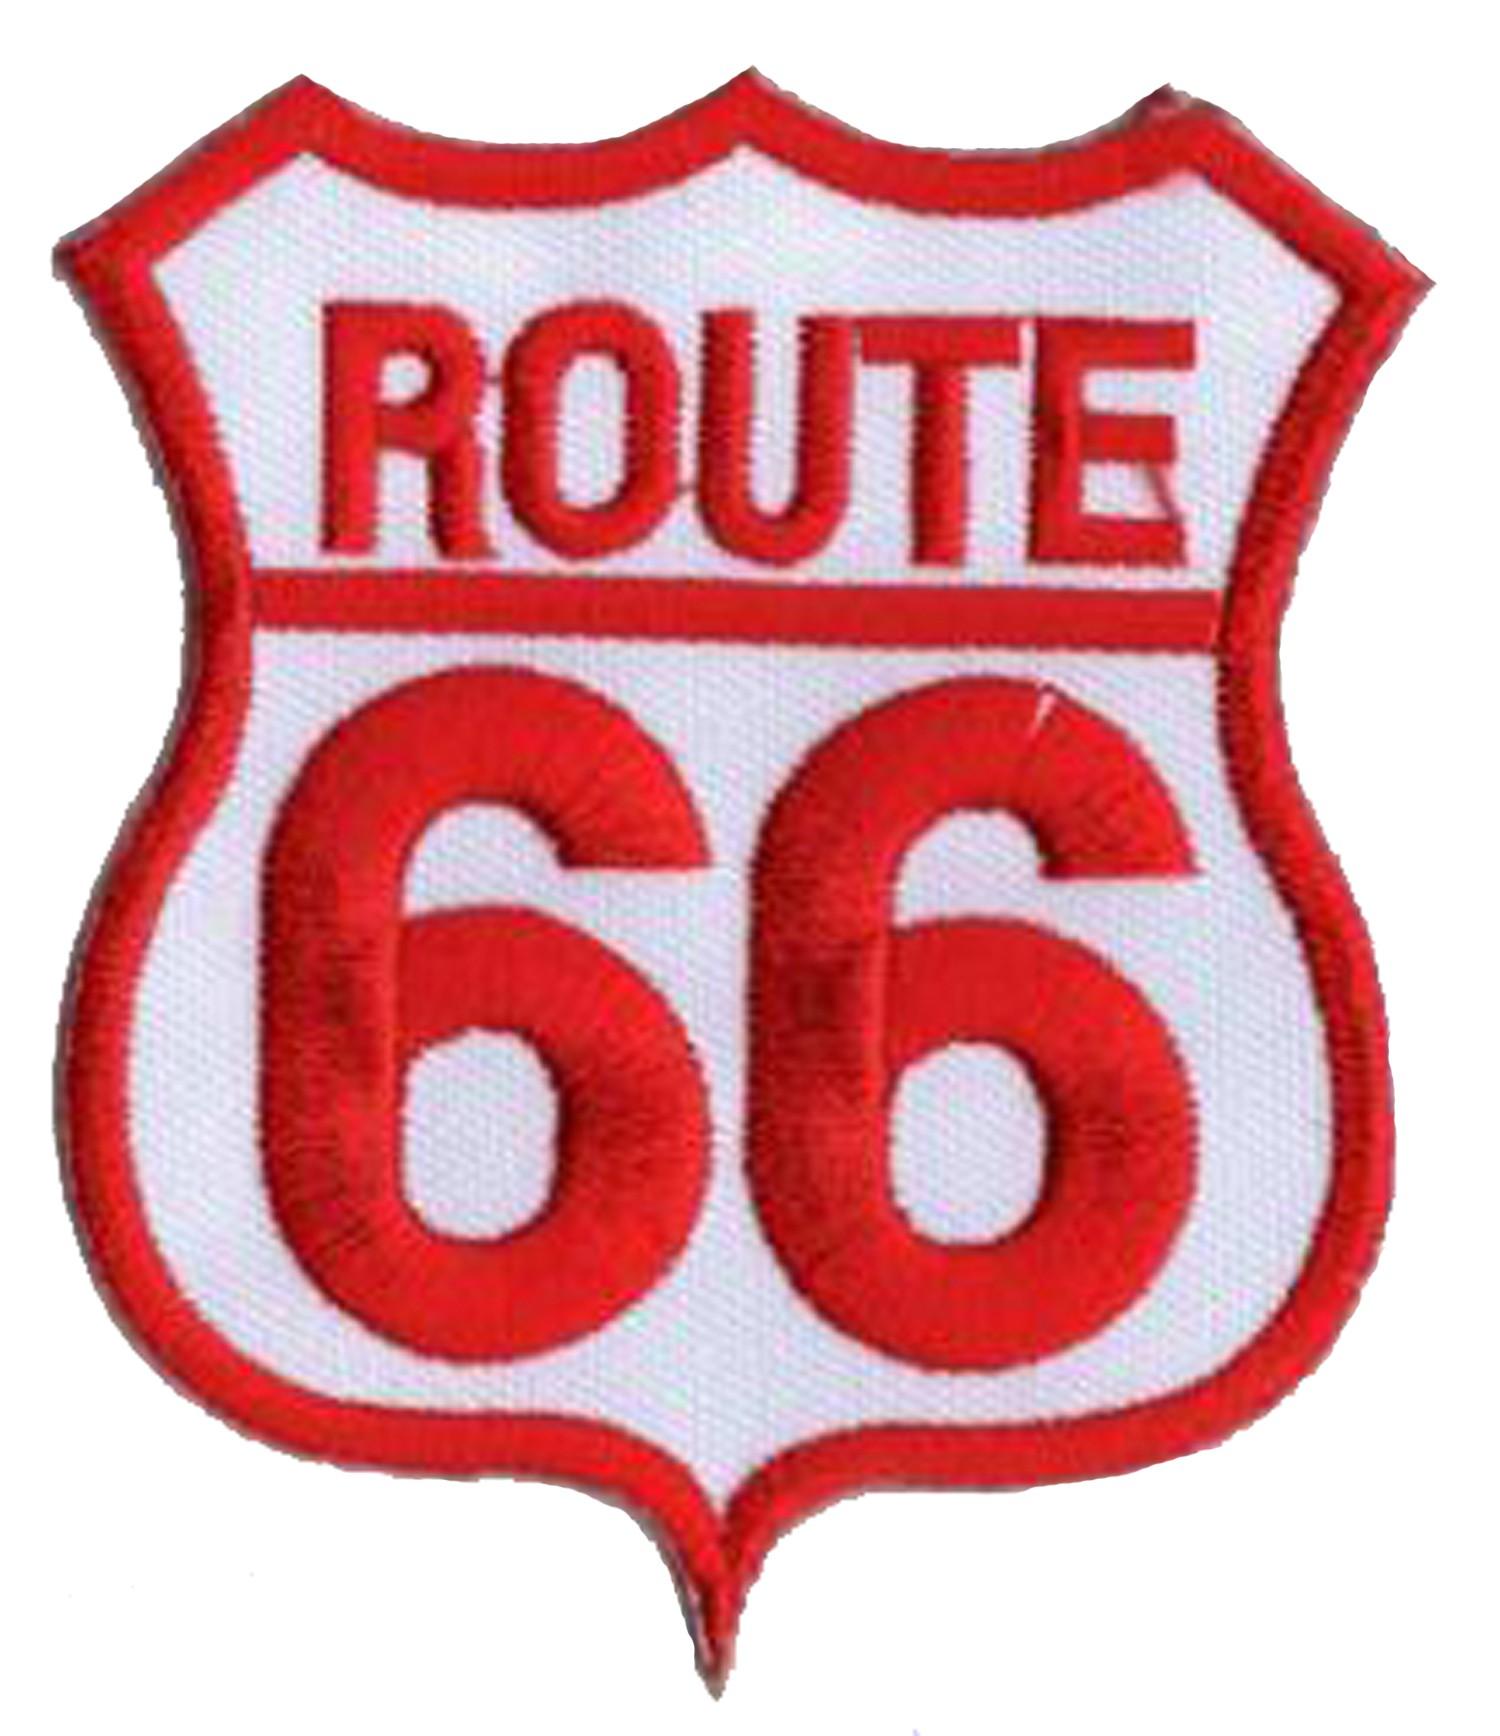 NagaPatches Patche /écusson thermocollant Route 66